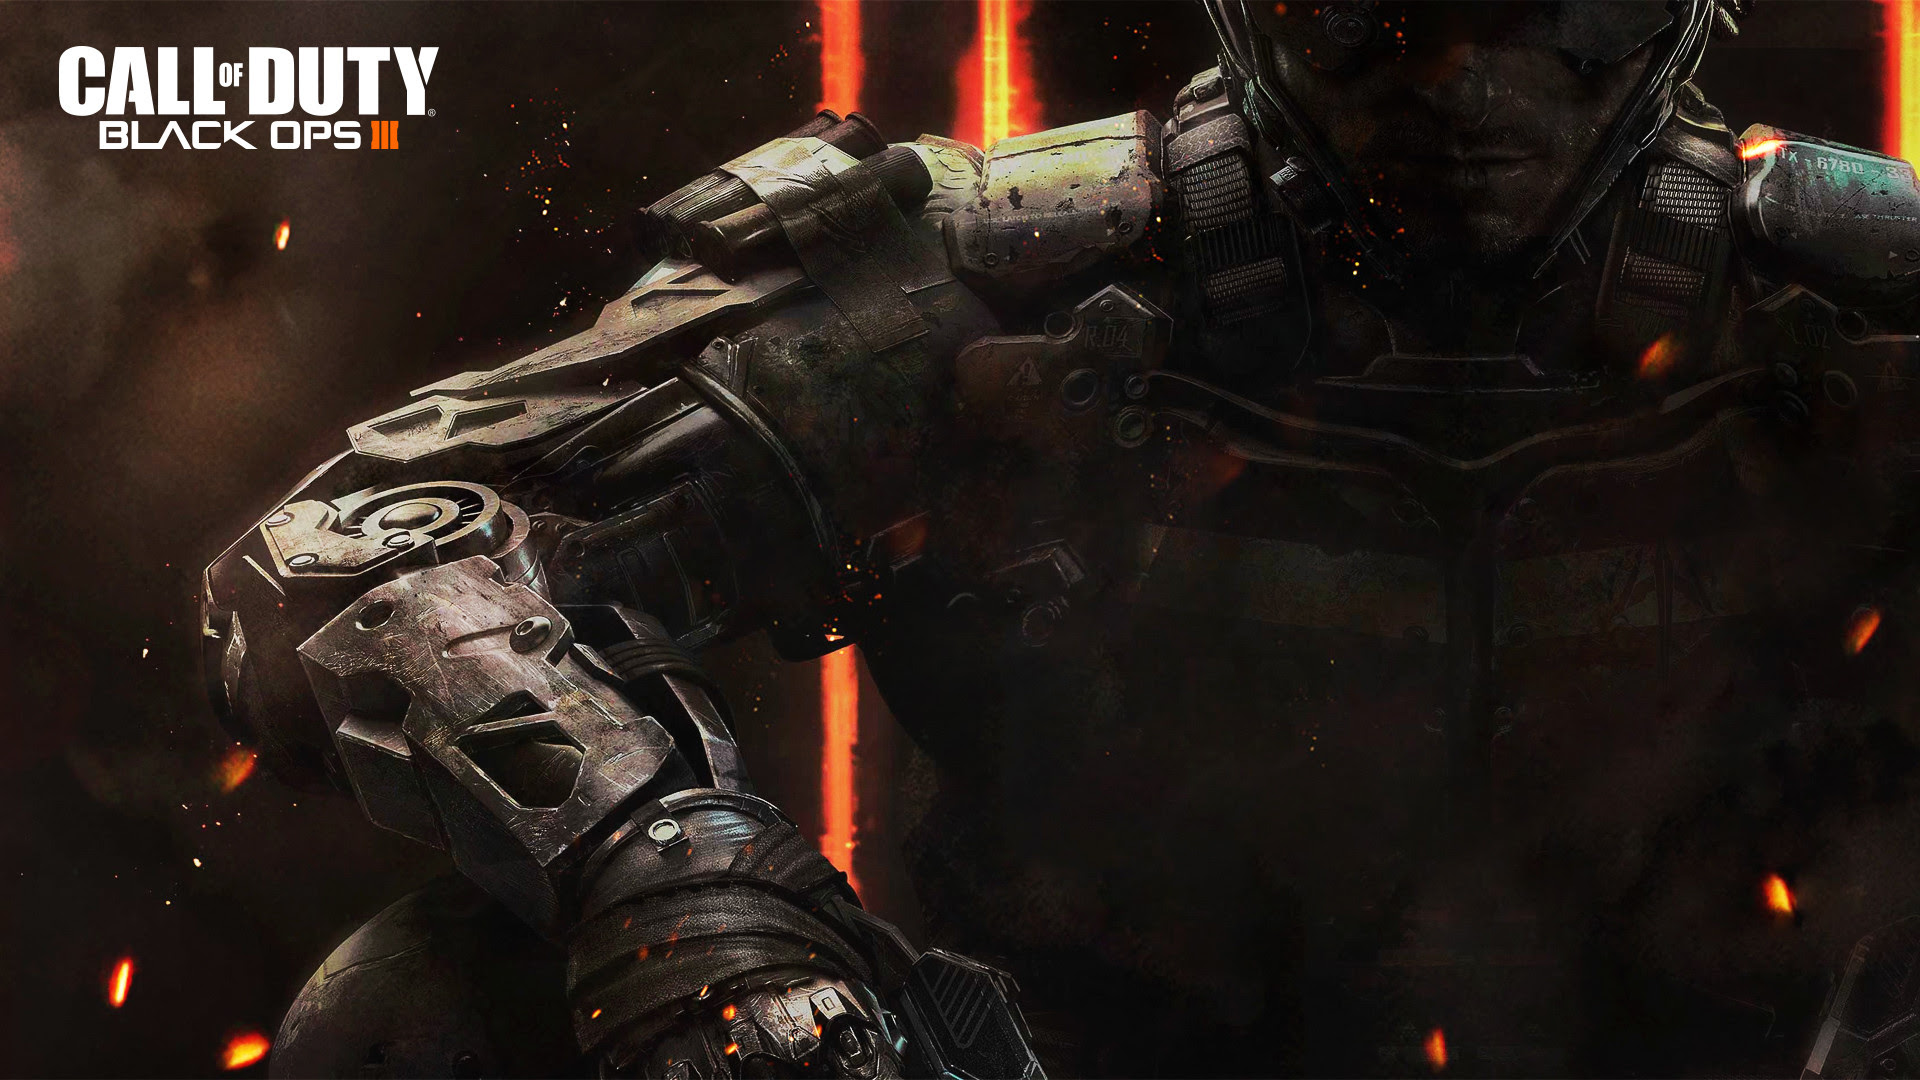 Cod Black Ops 3 Wallpaper 78 Images